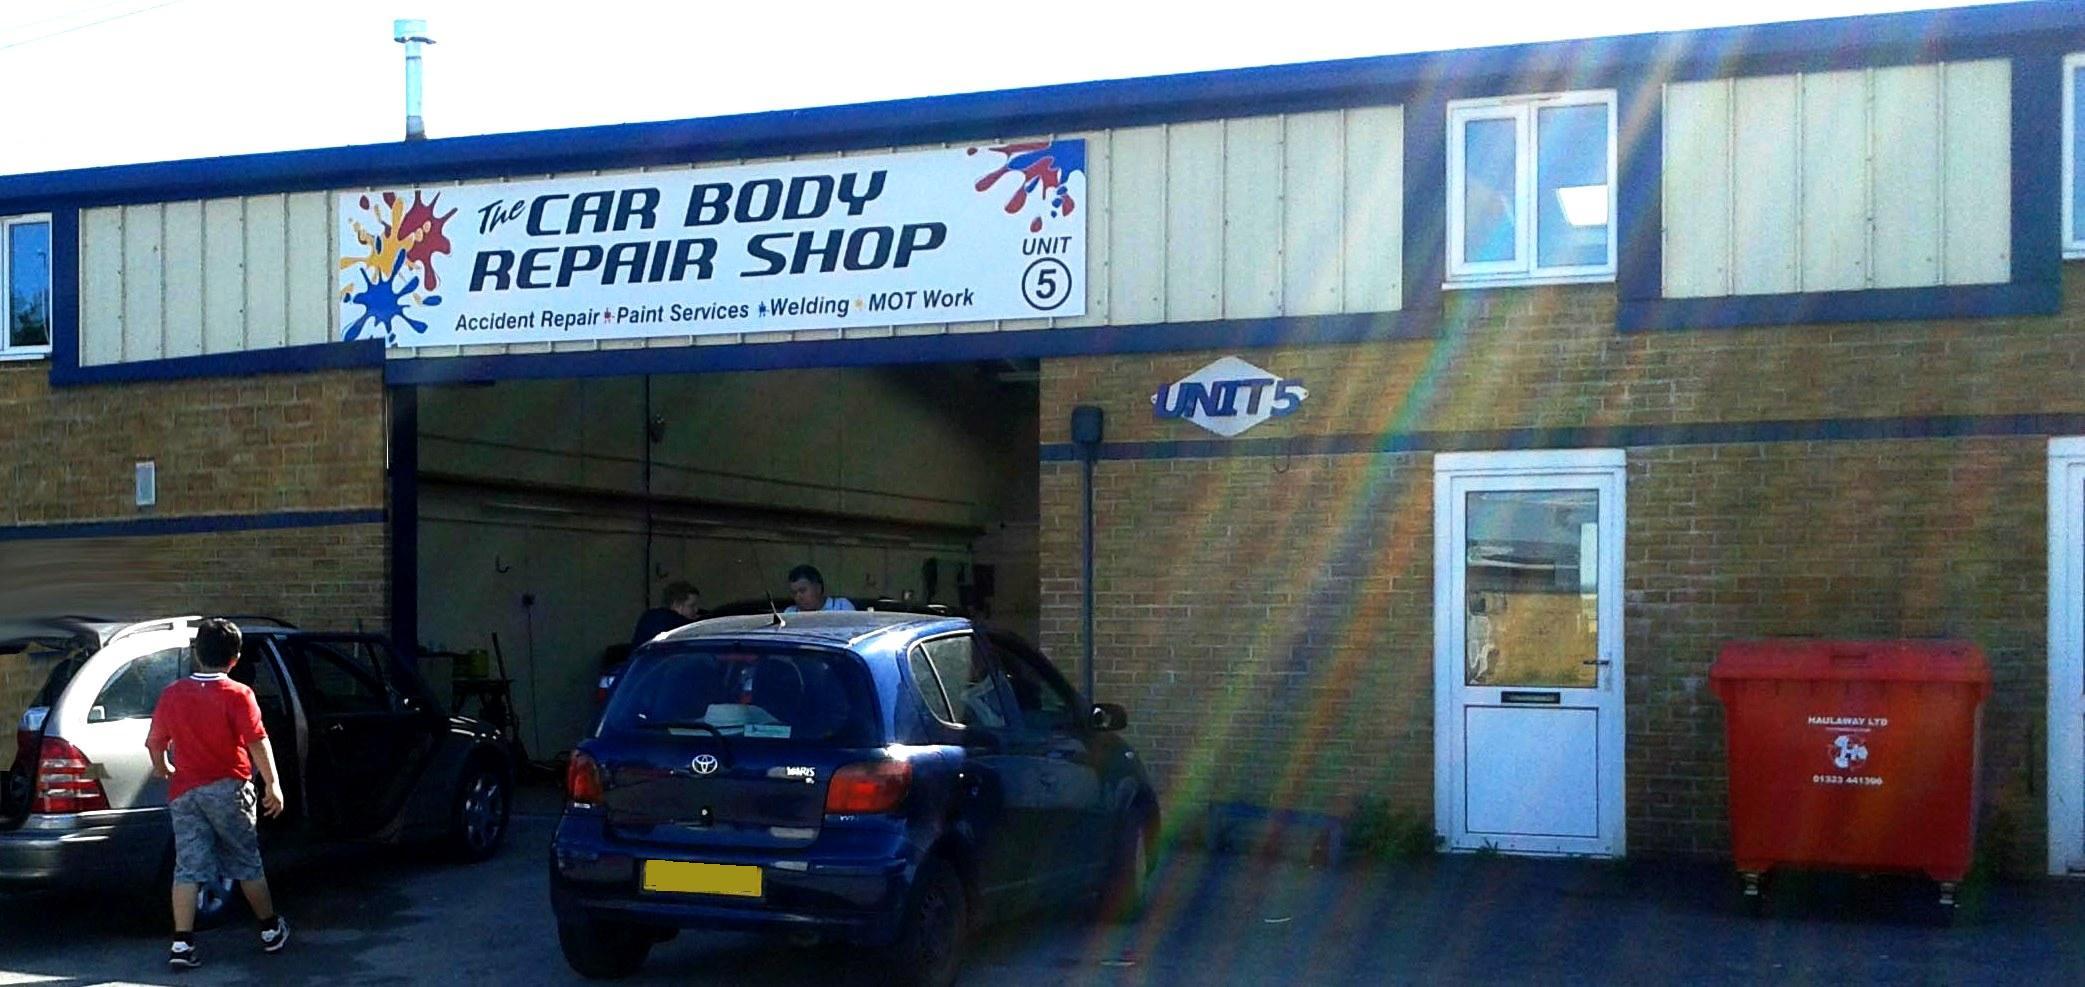 Car Body Repair Shop Eastbourne